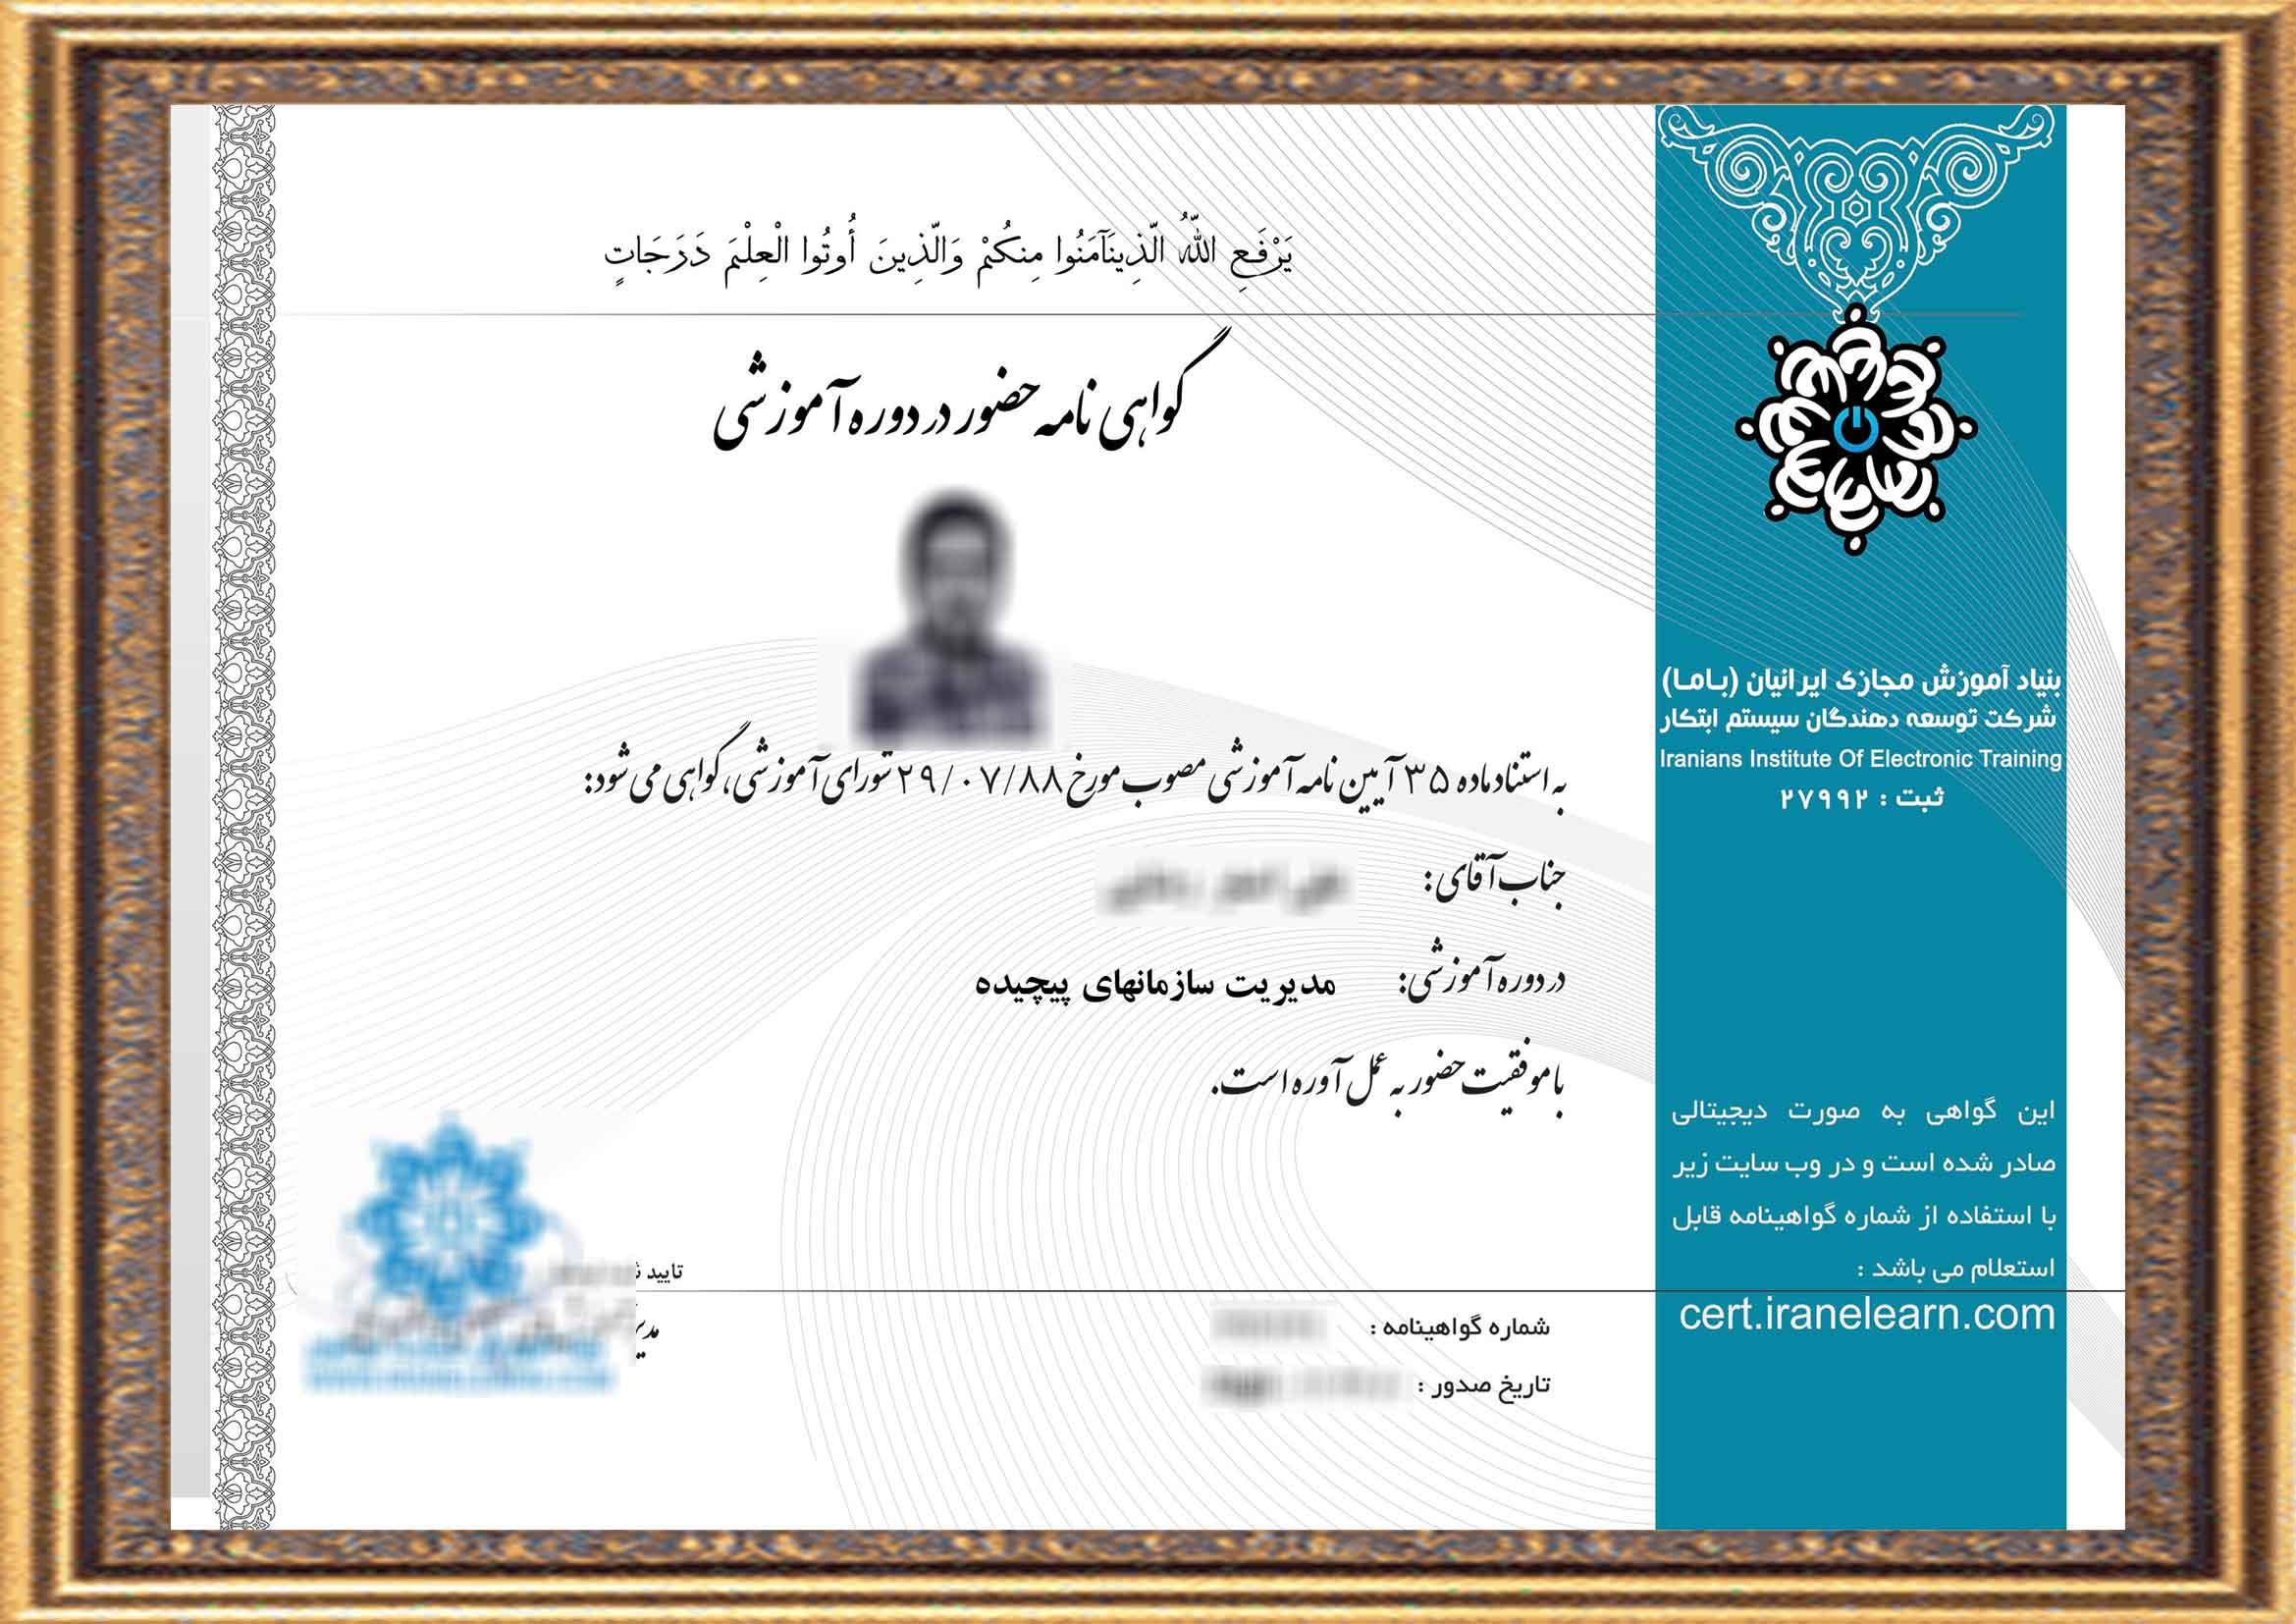 http://iranelearn.com/wp-content/uploads/2013/05/eba00012047000000-1.jpg